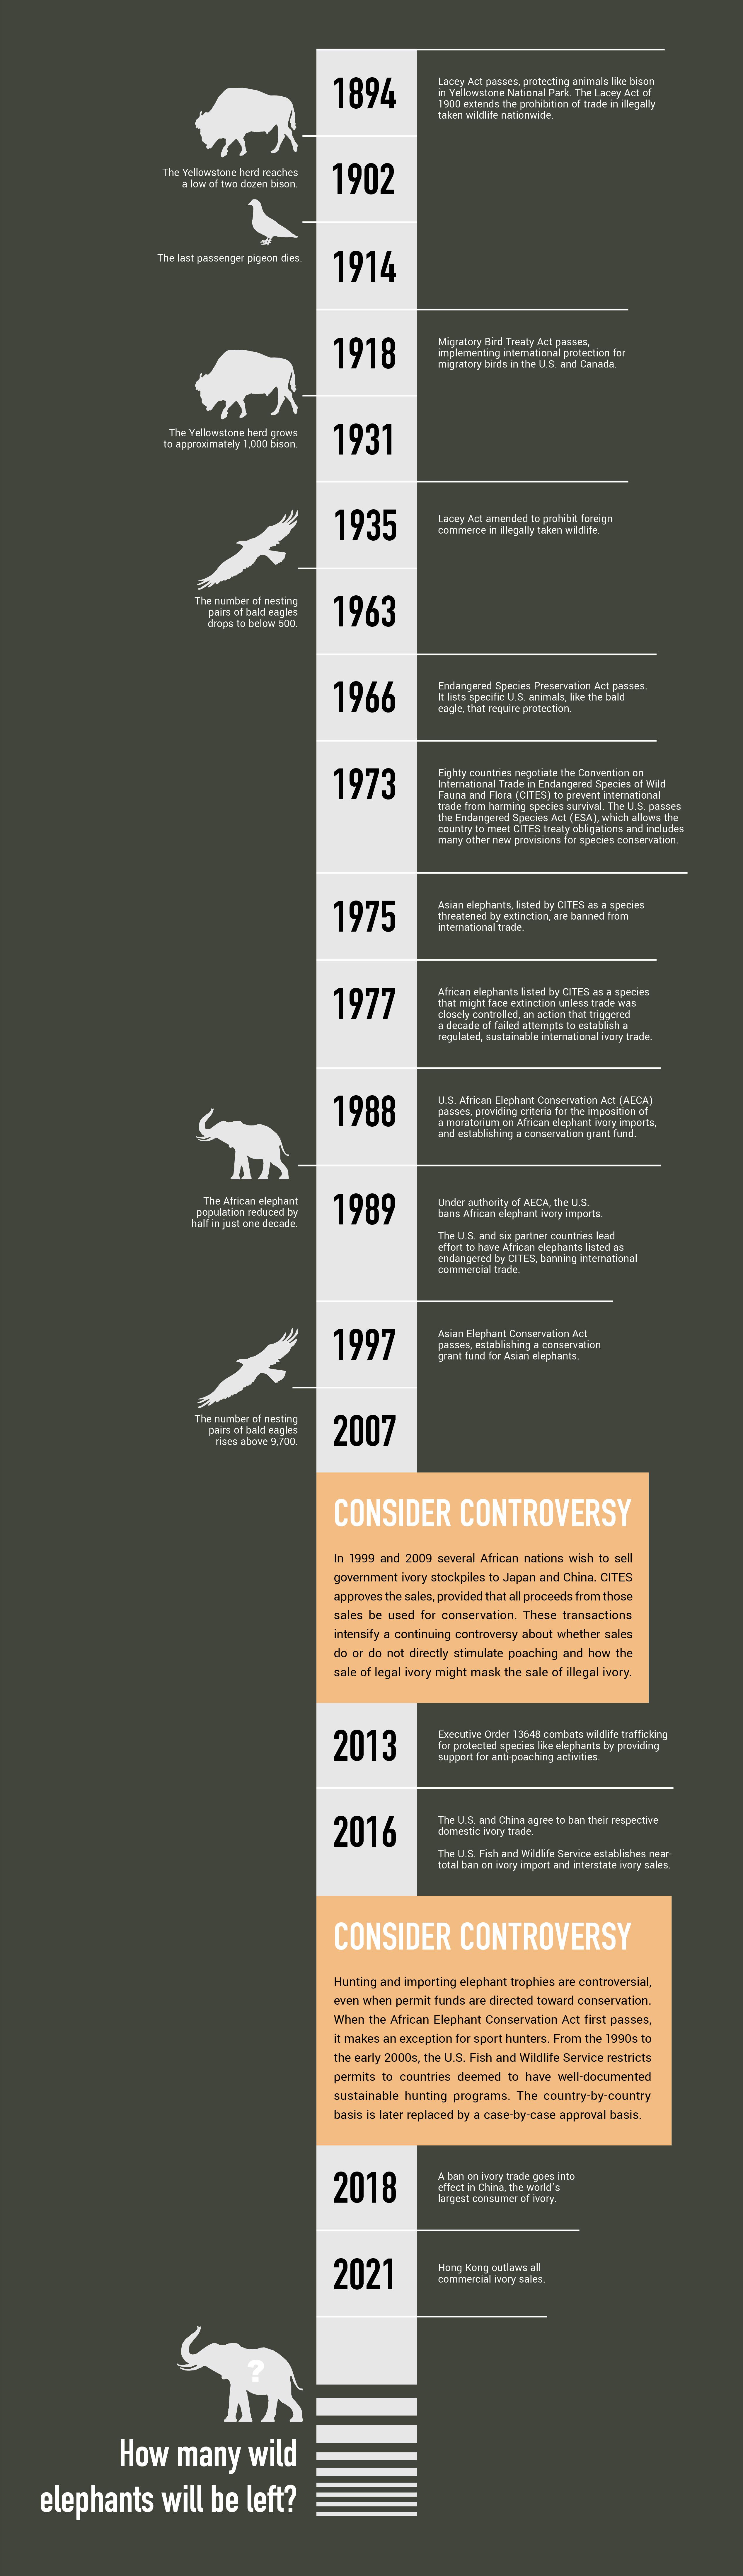 Elephant conservation timeline